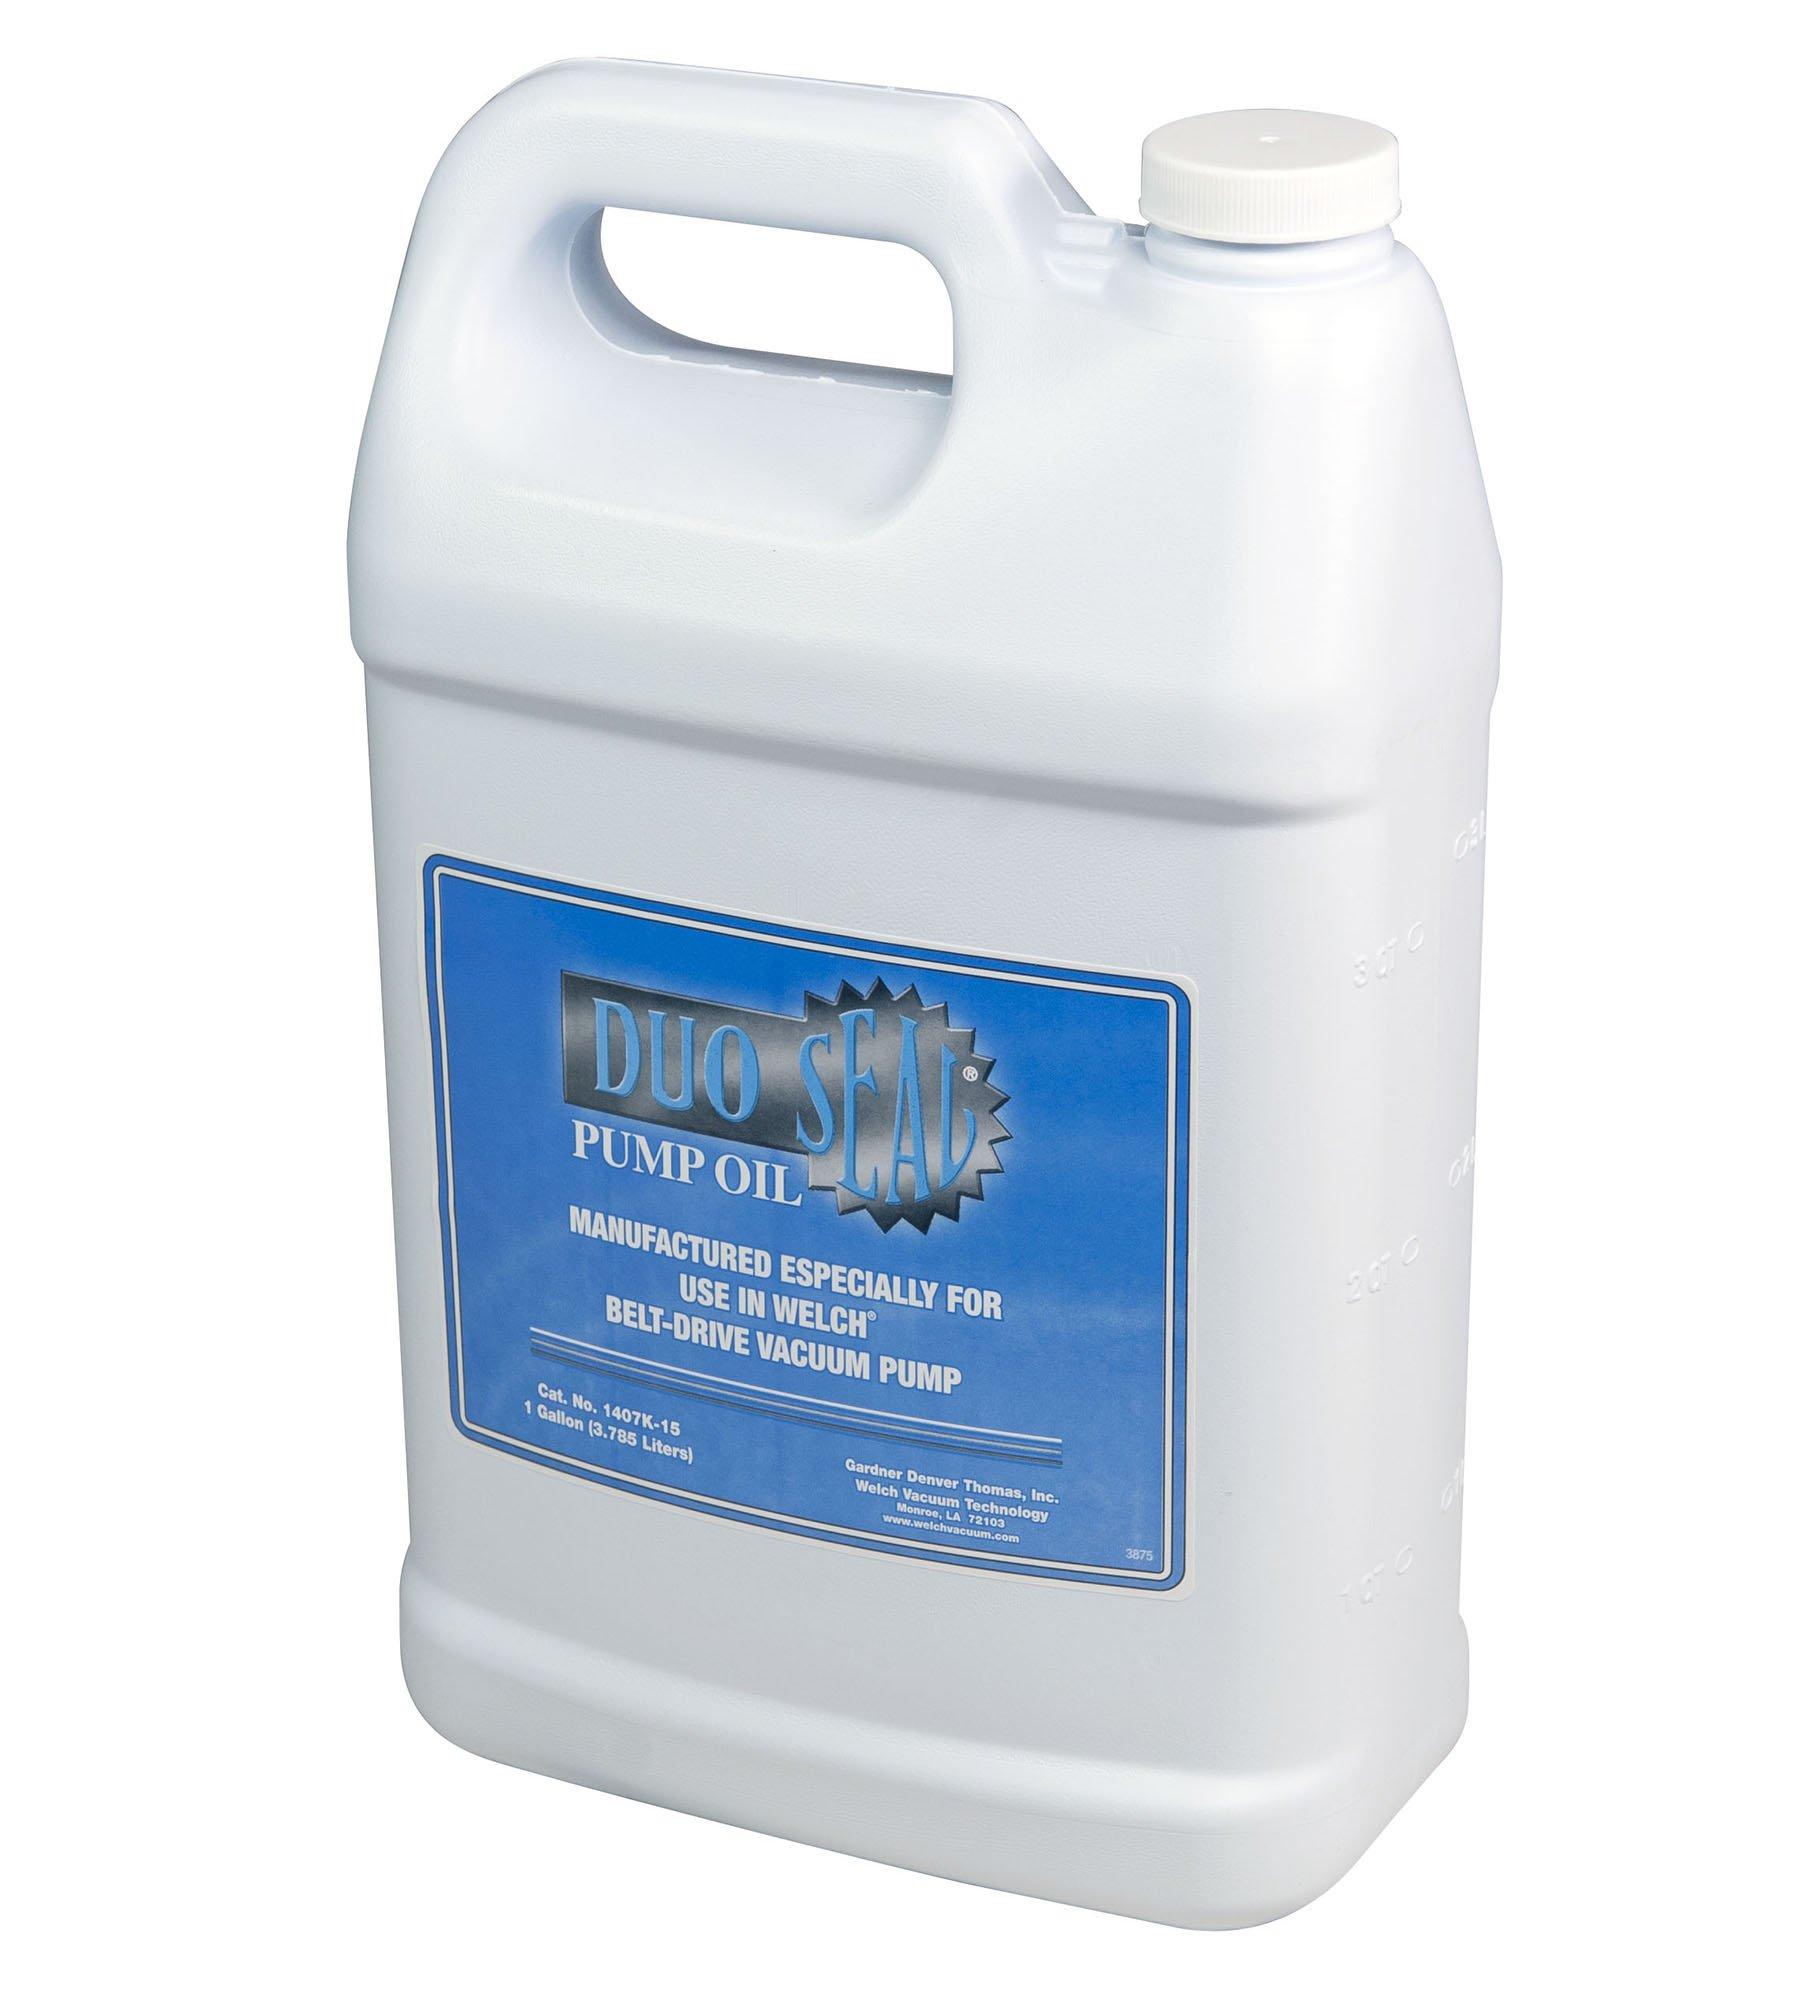 Welch Vacuum 1407K-15 Duo Seal Pump Oil, 1 gal